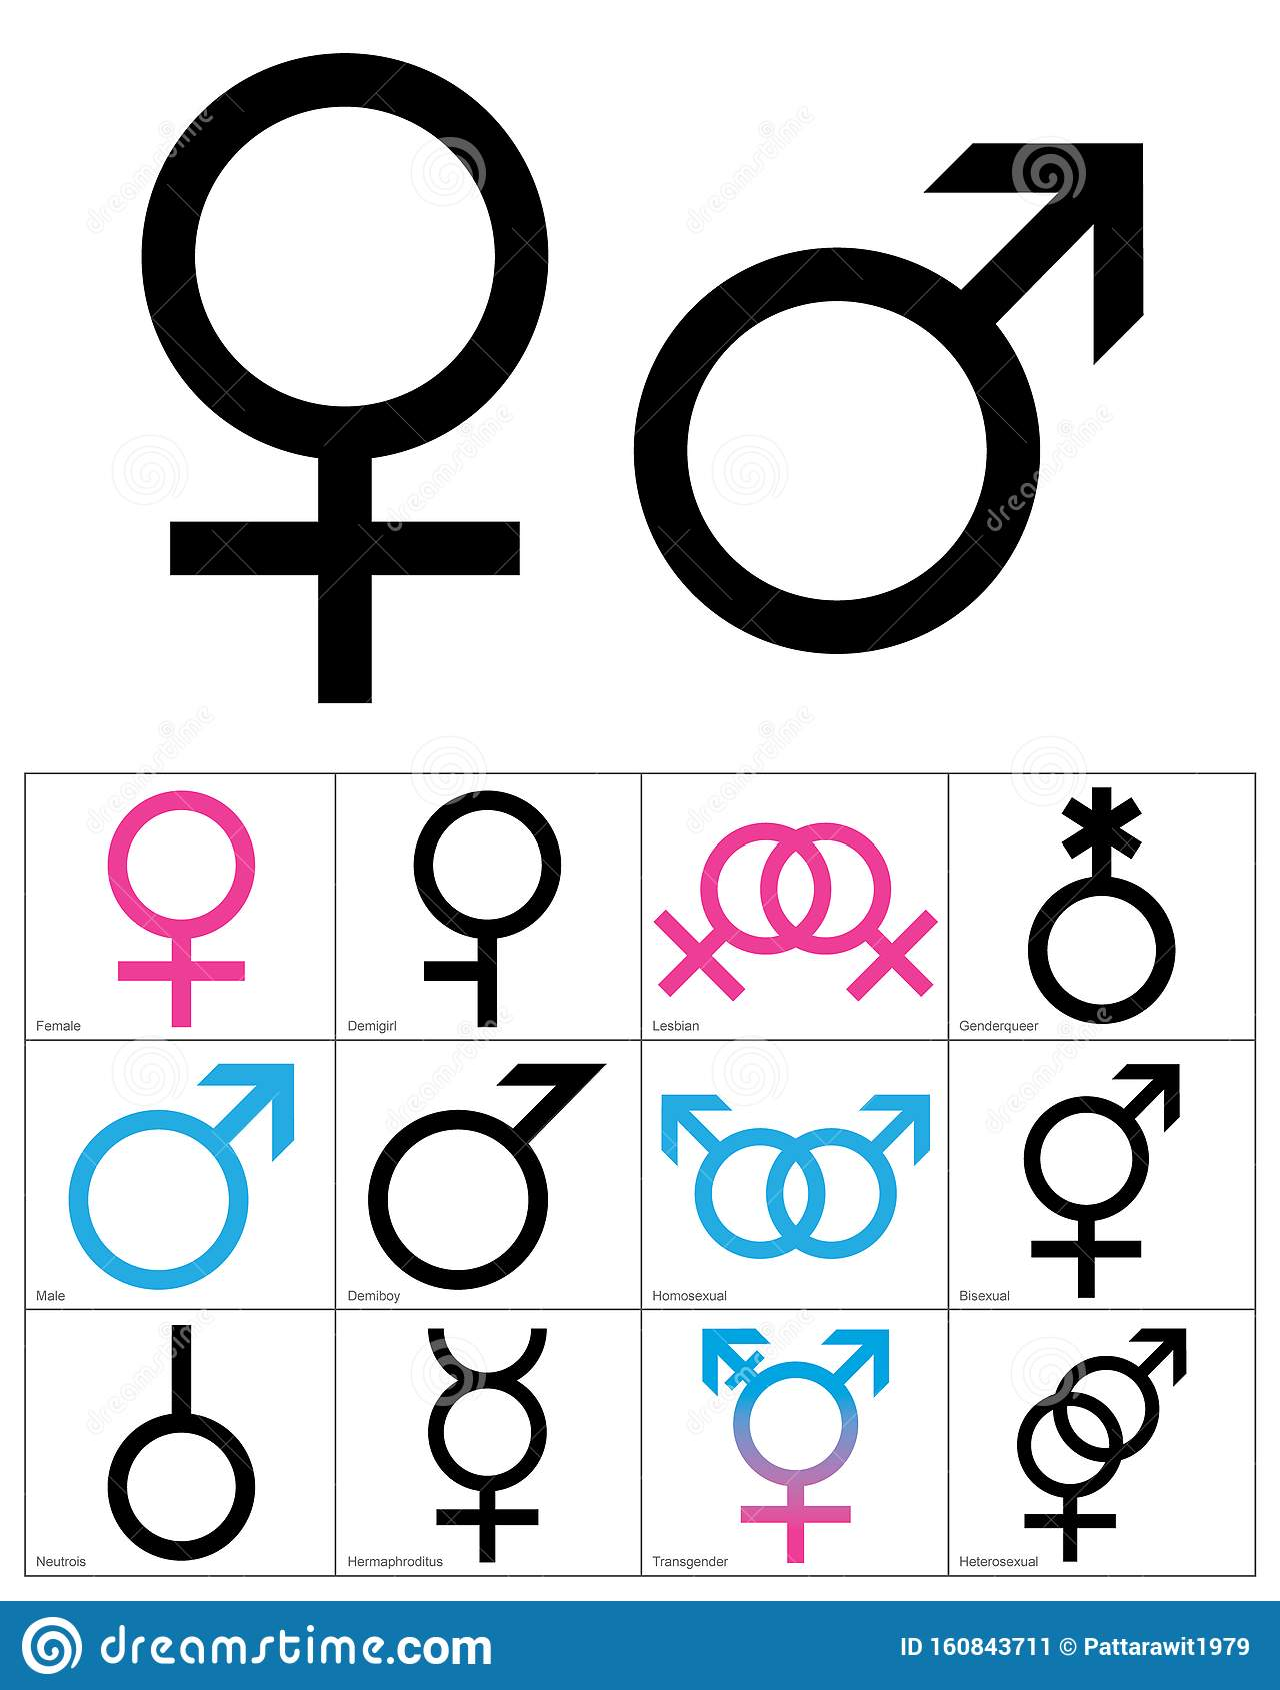 Female to photos transgender male Transgender woman